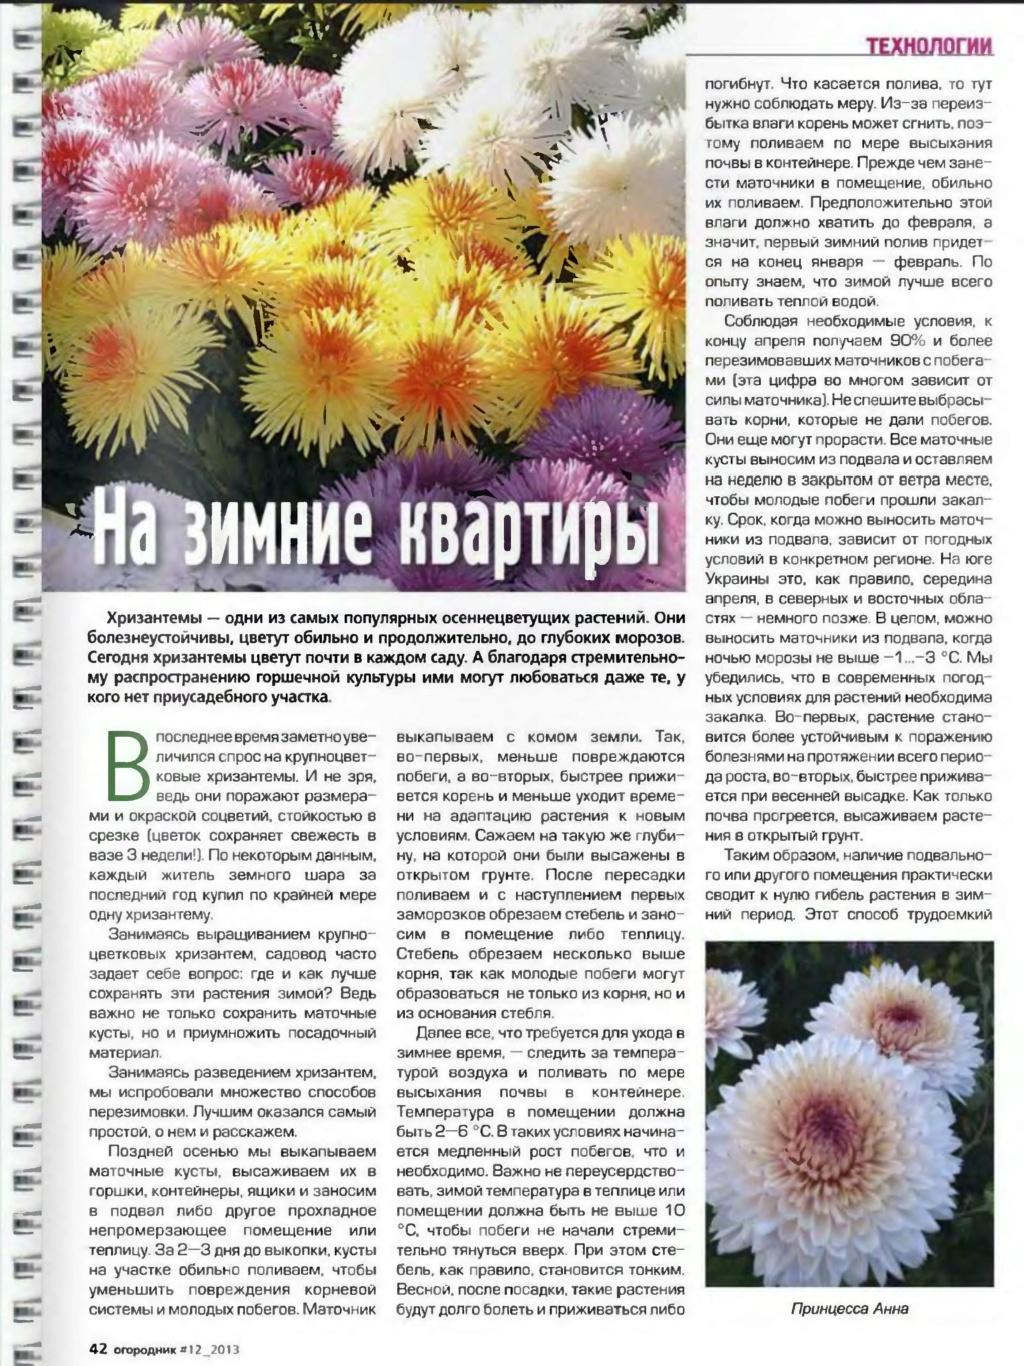 хризантема P003510